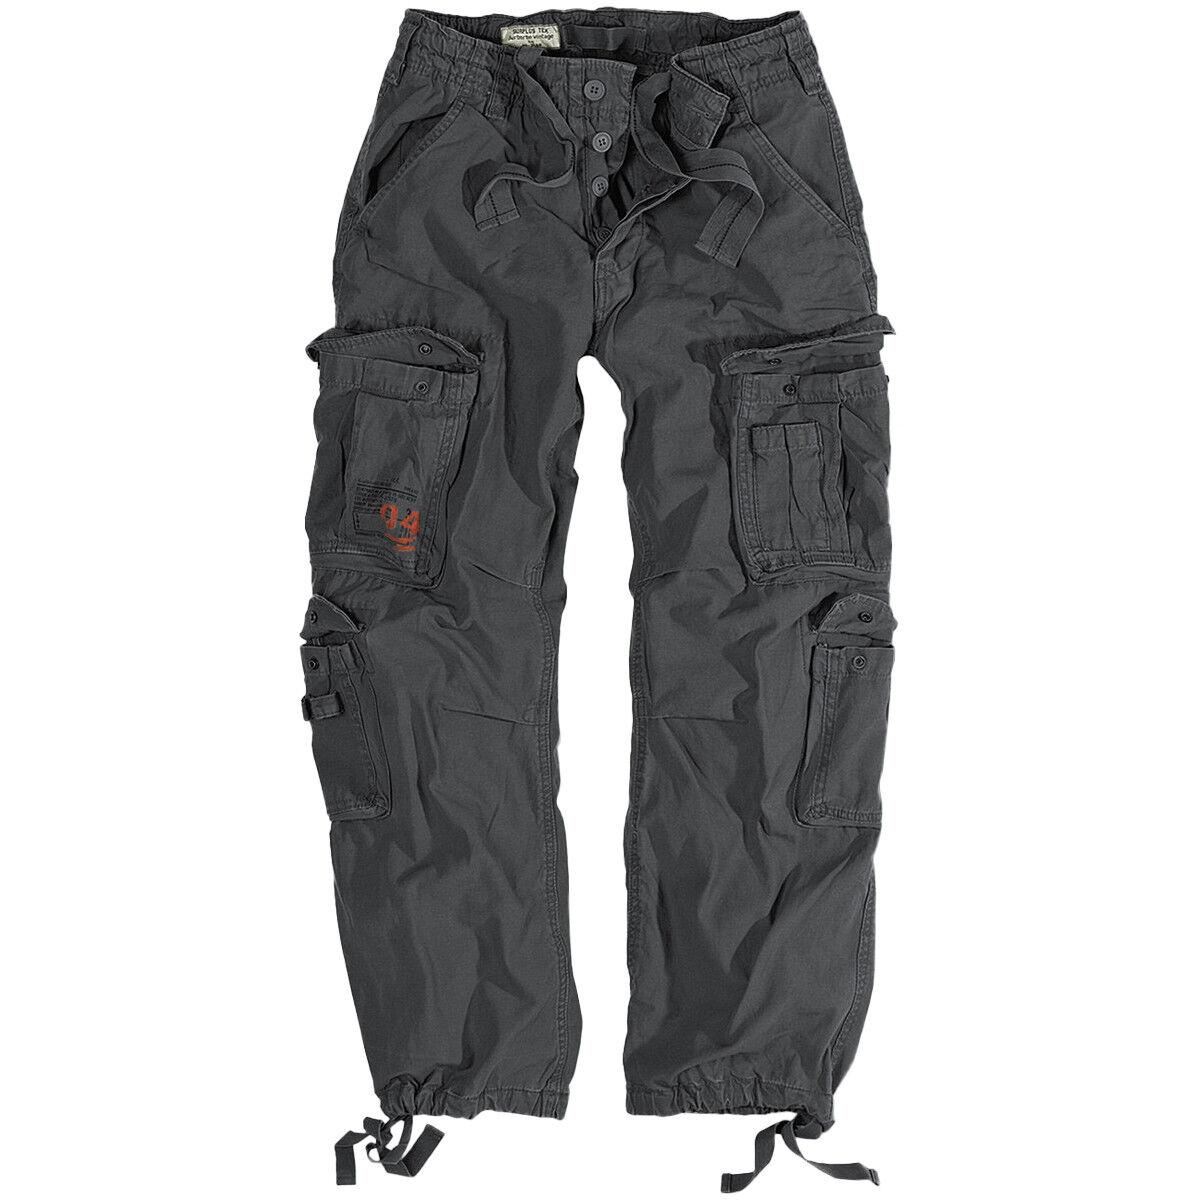 Surplus Airborne Vintage Trousers Mens Cotton Cargo Combat Trousers Anthracite